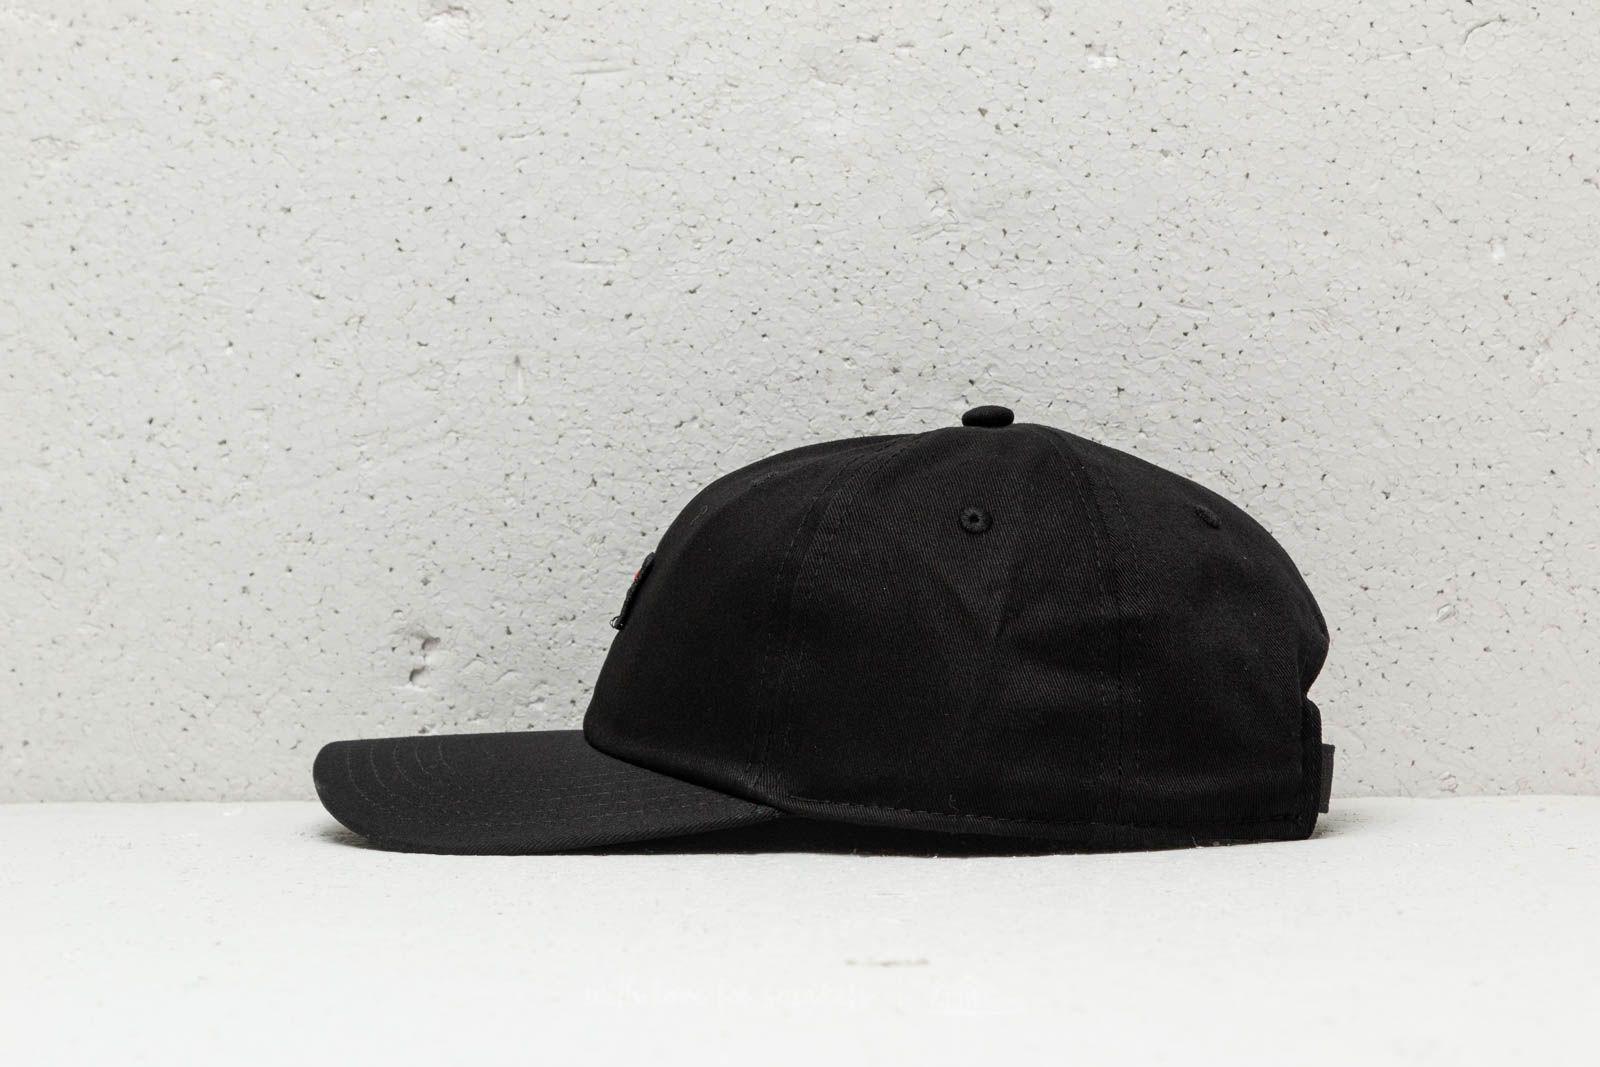 b49b5041d5b Fila Dad Cap Strapback Black at a great price 21 € buy at Footshop